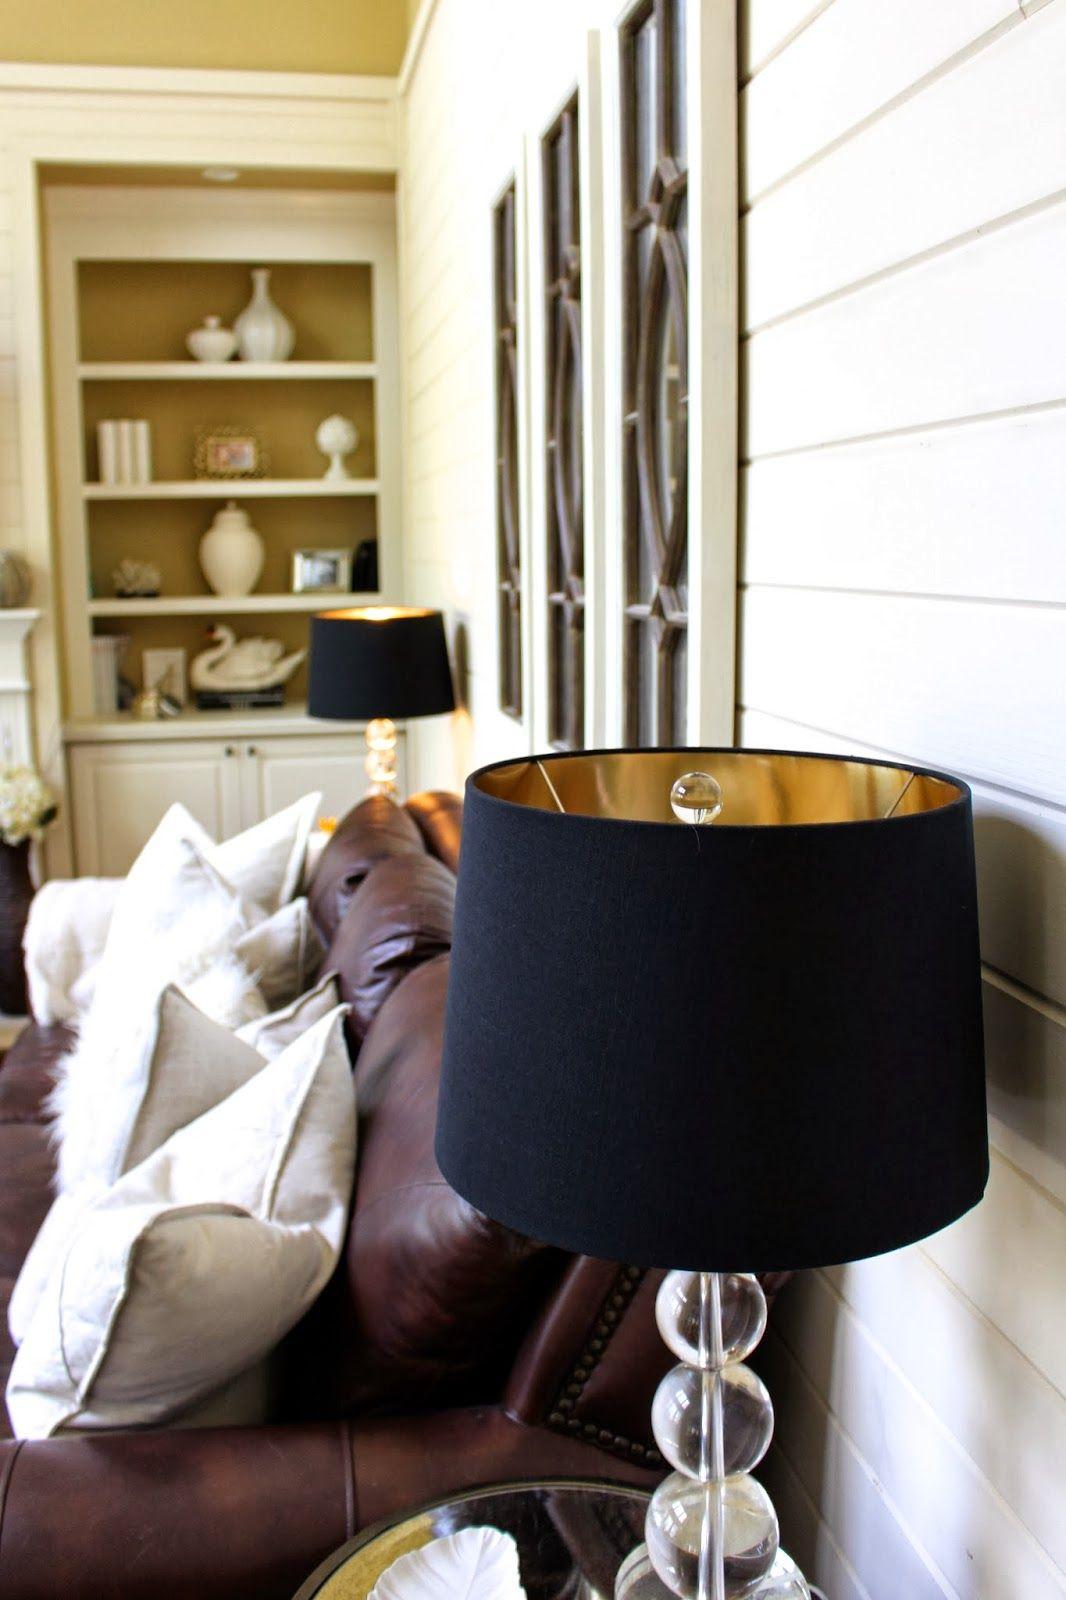 Black lamp shades with gold interior lining Farmhouse